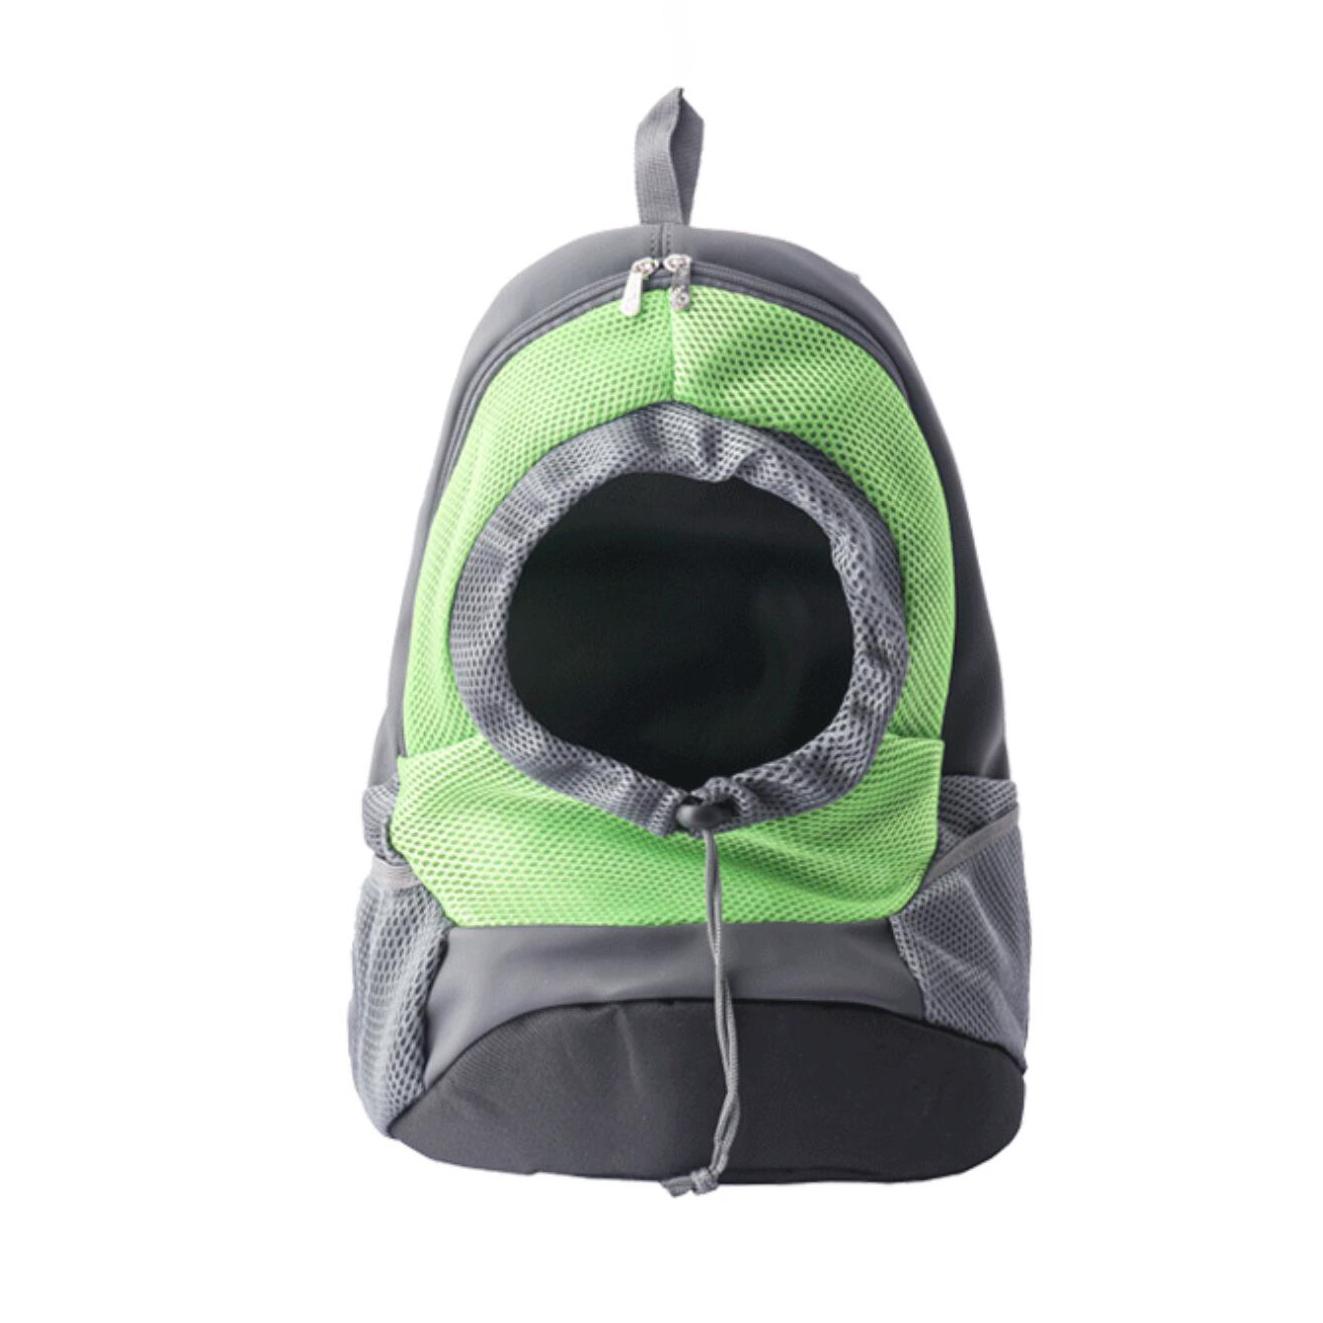 Ape Basics: Dog Travel Chest Bag - Green image